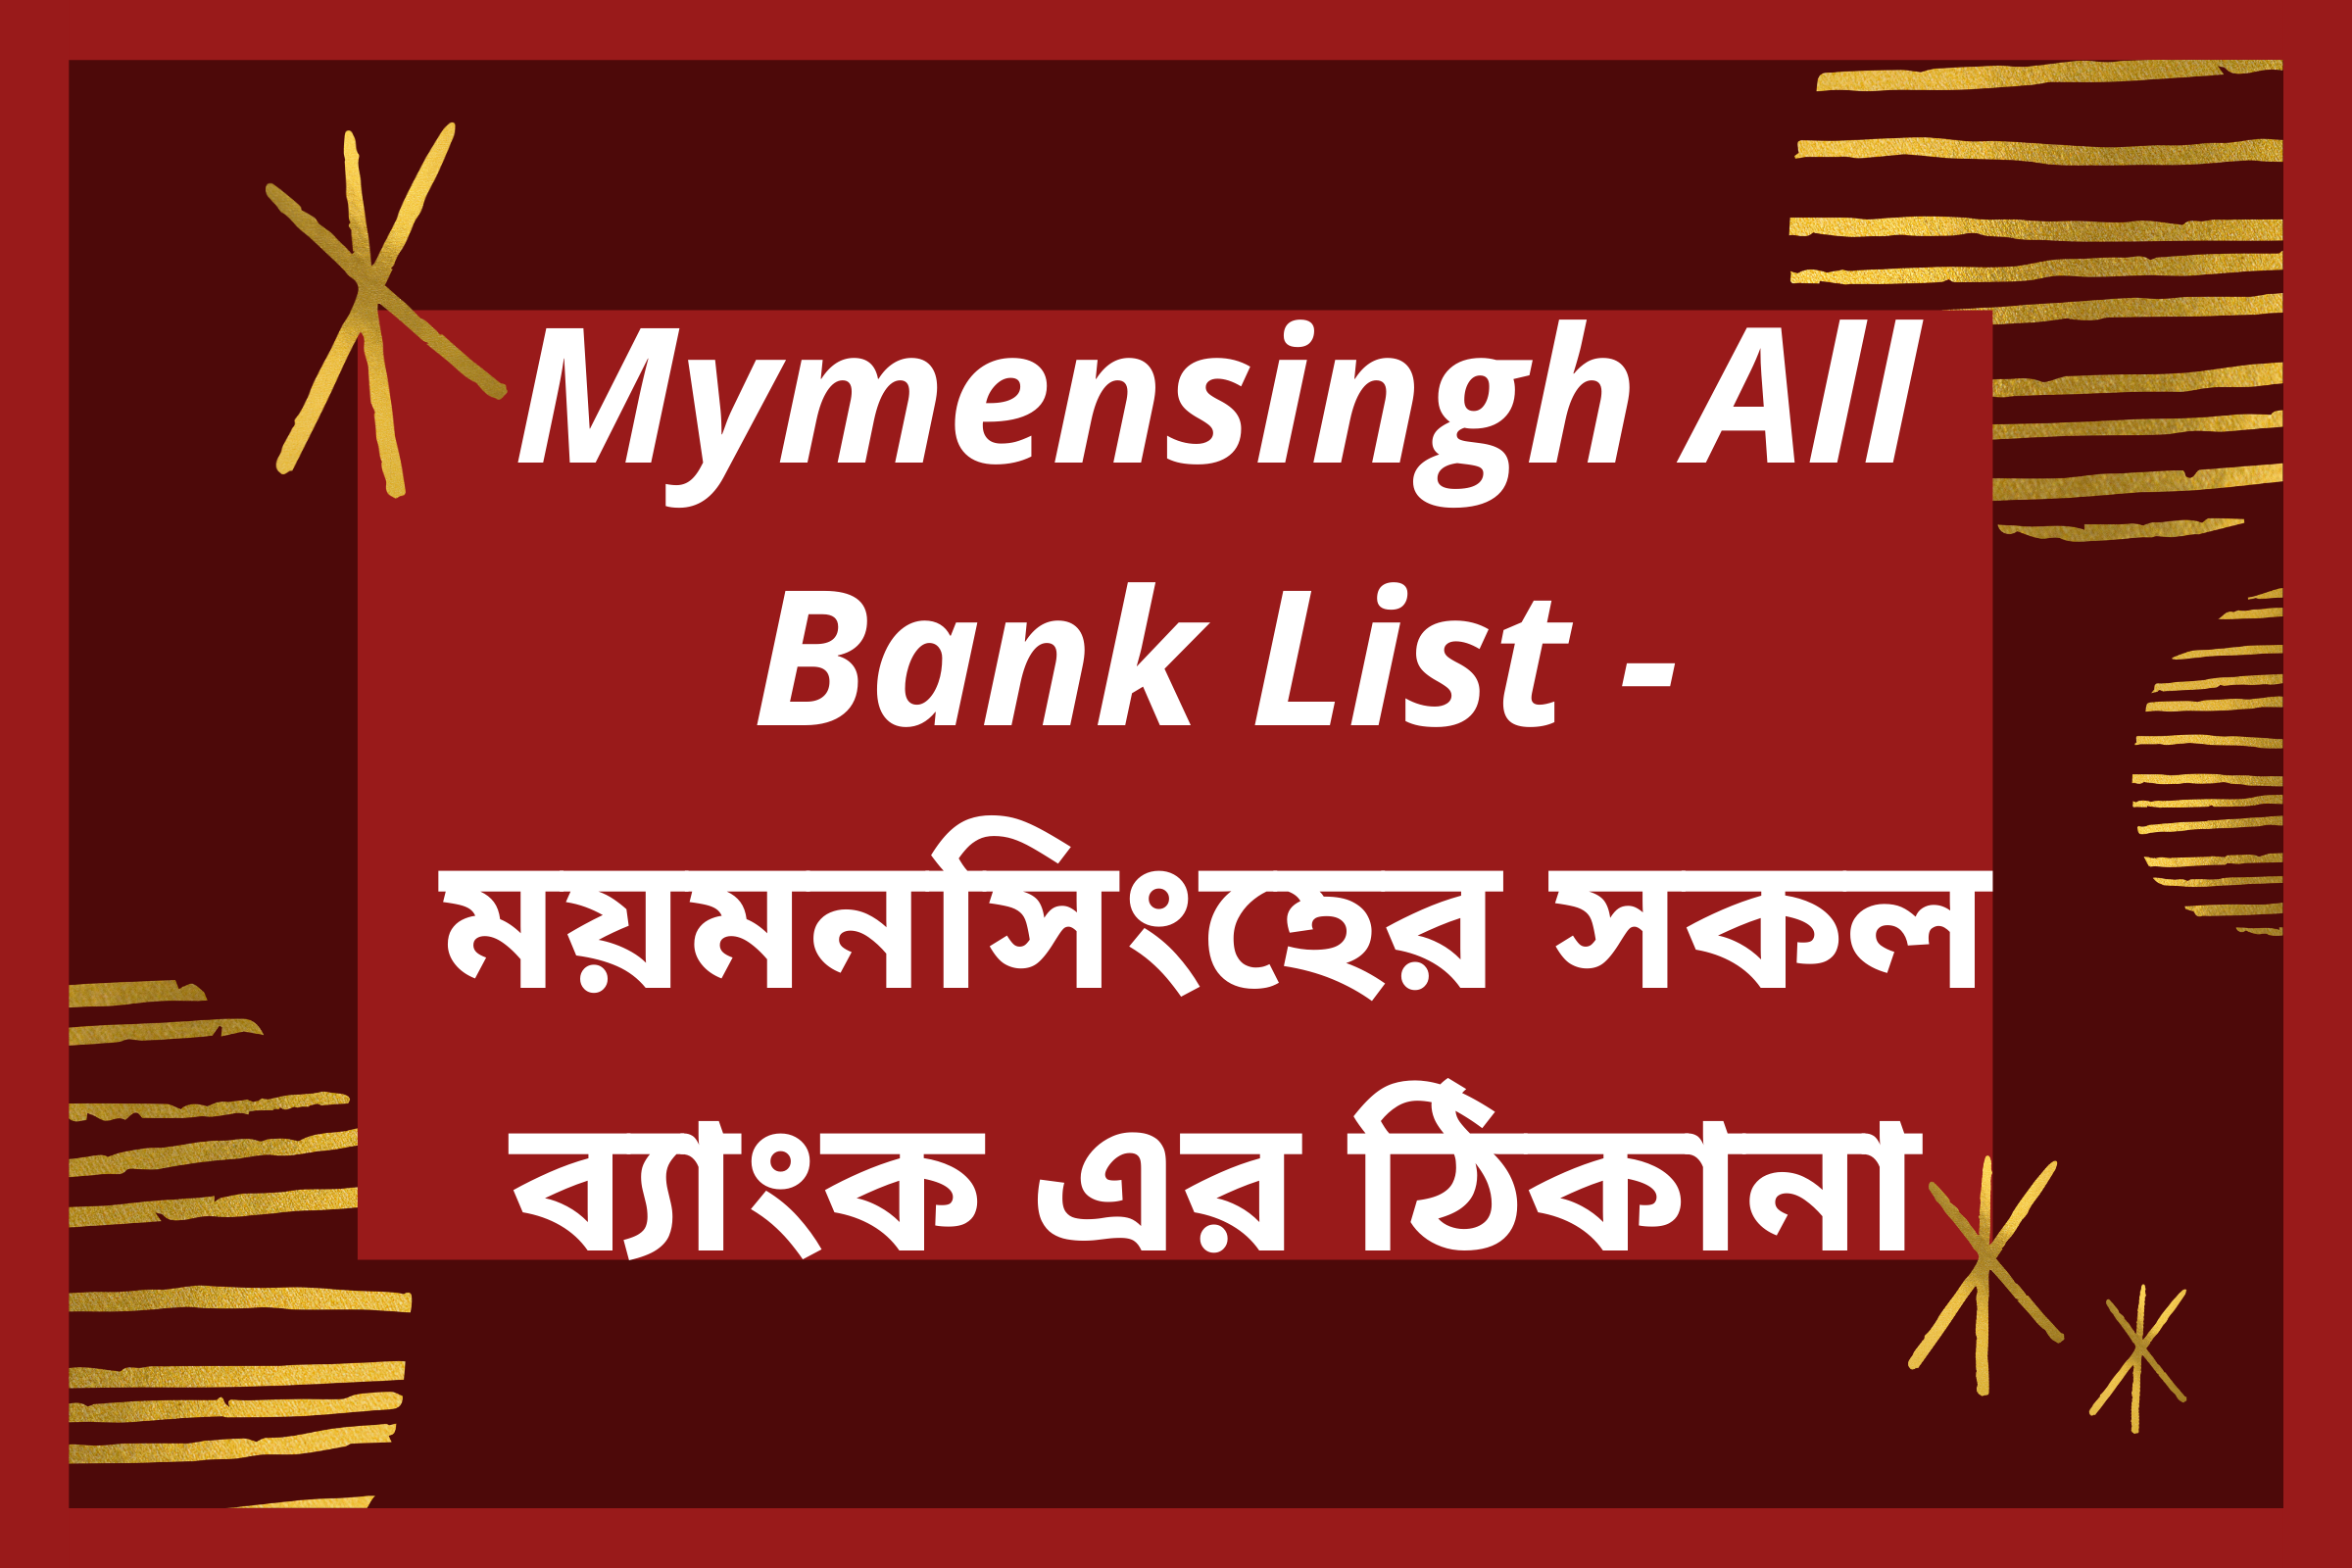 Mymensingh All Bank List - ময়মনসিংহের সকল ব্যাংক এর ঠিকানা